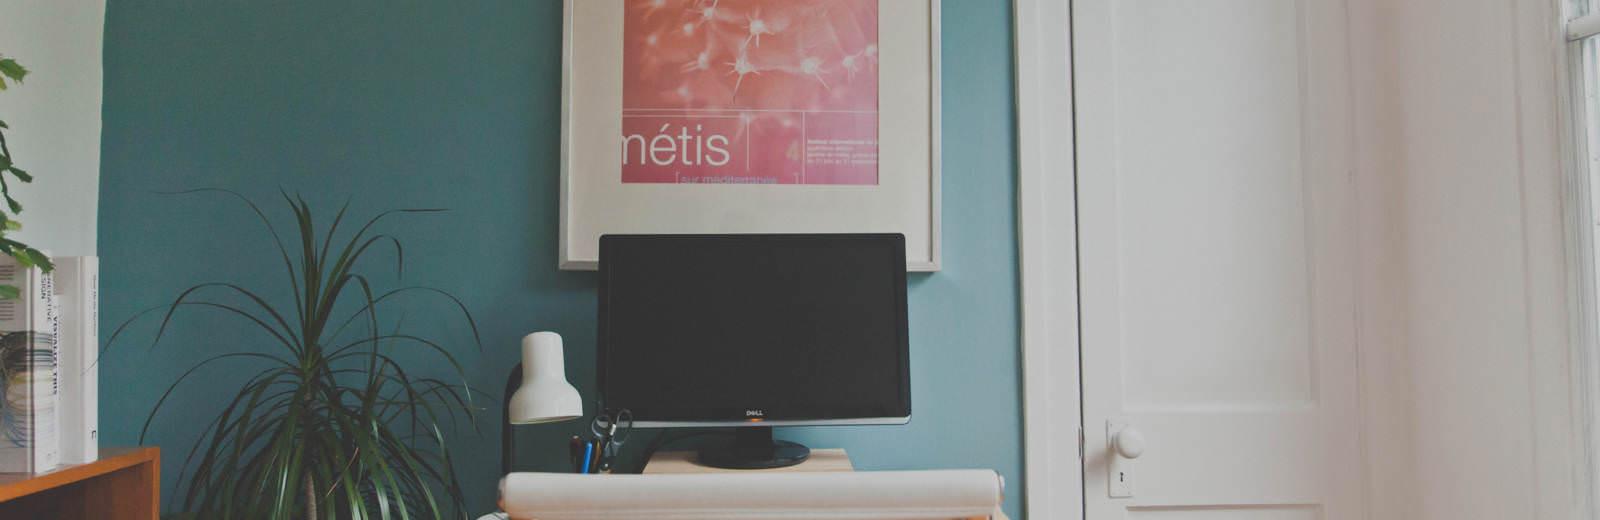 Vista west boise student housing reviews - App that puts santa in your living room ...